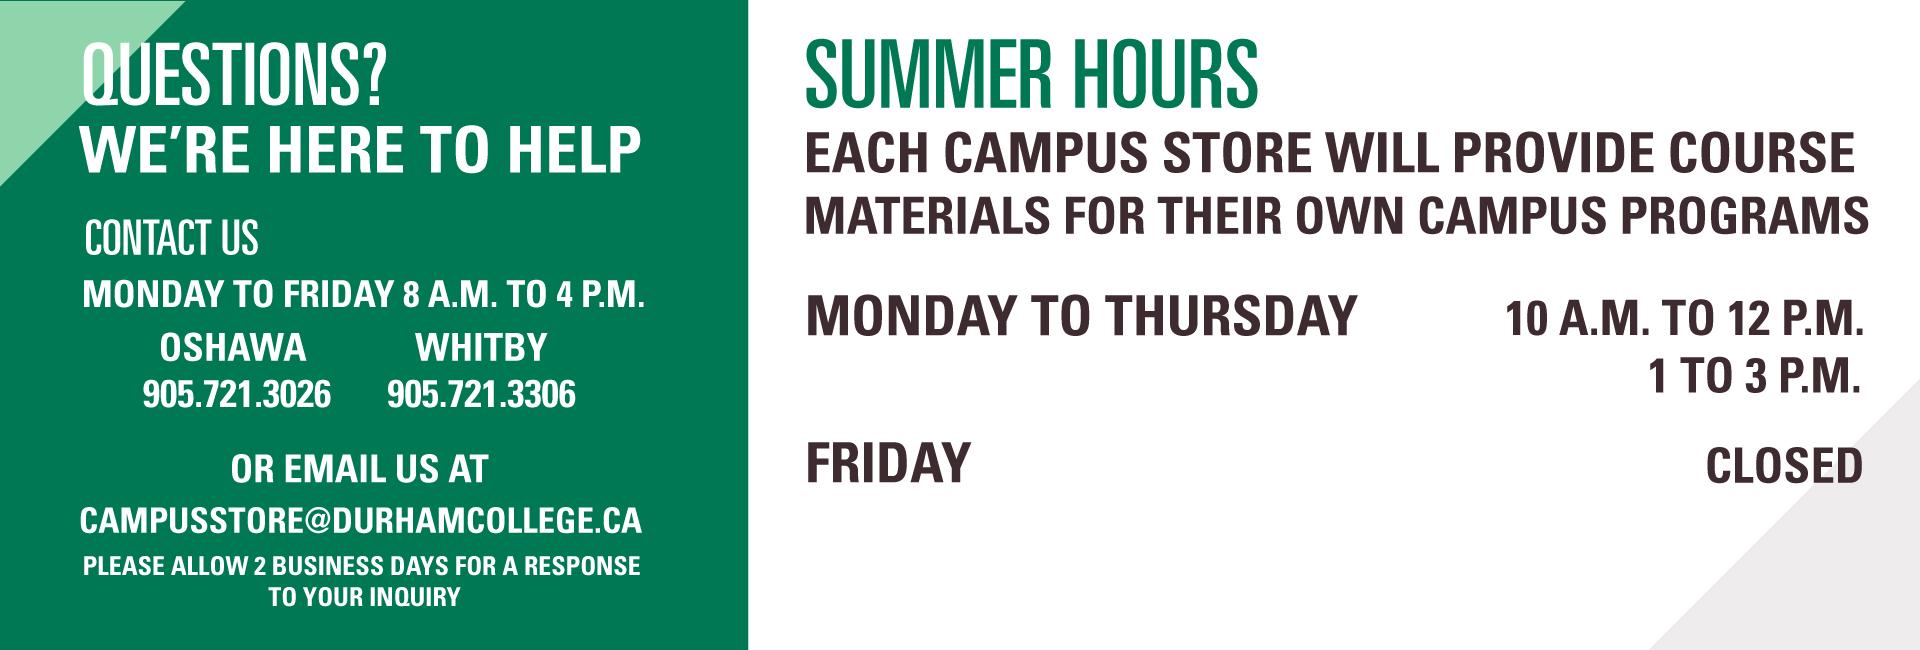 Campus store open